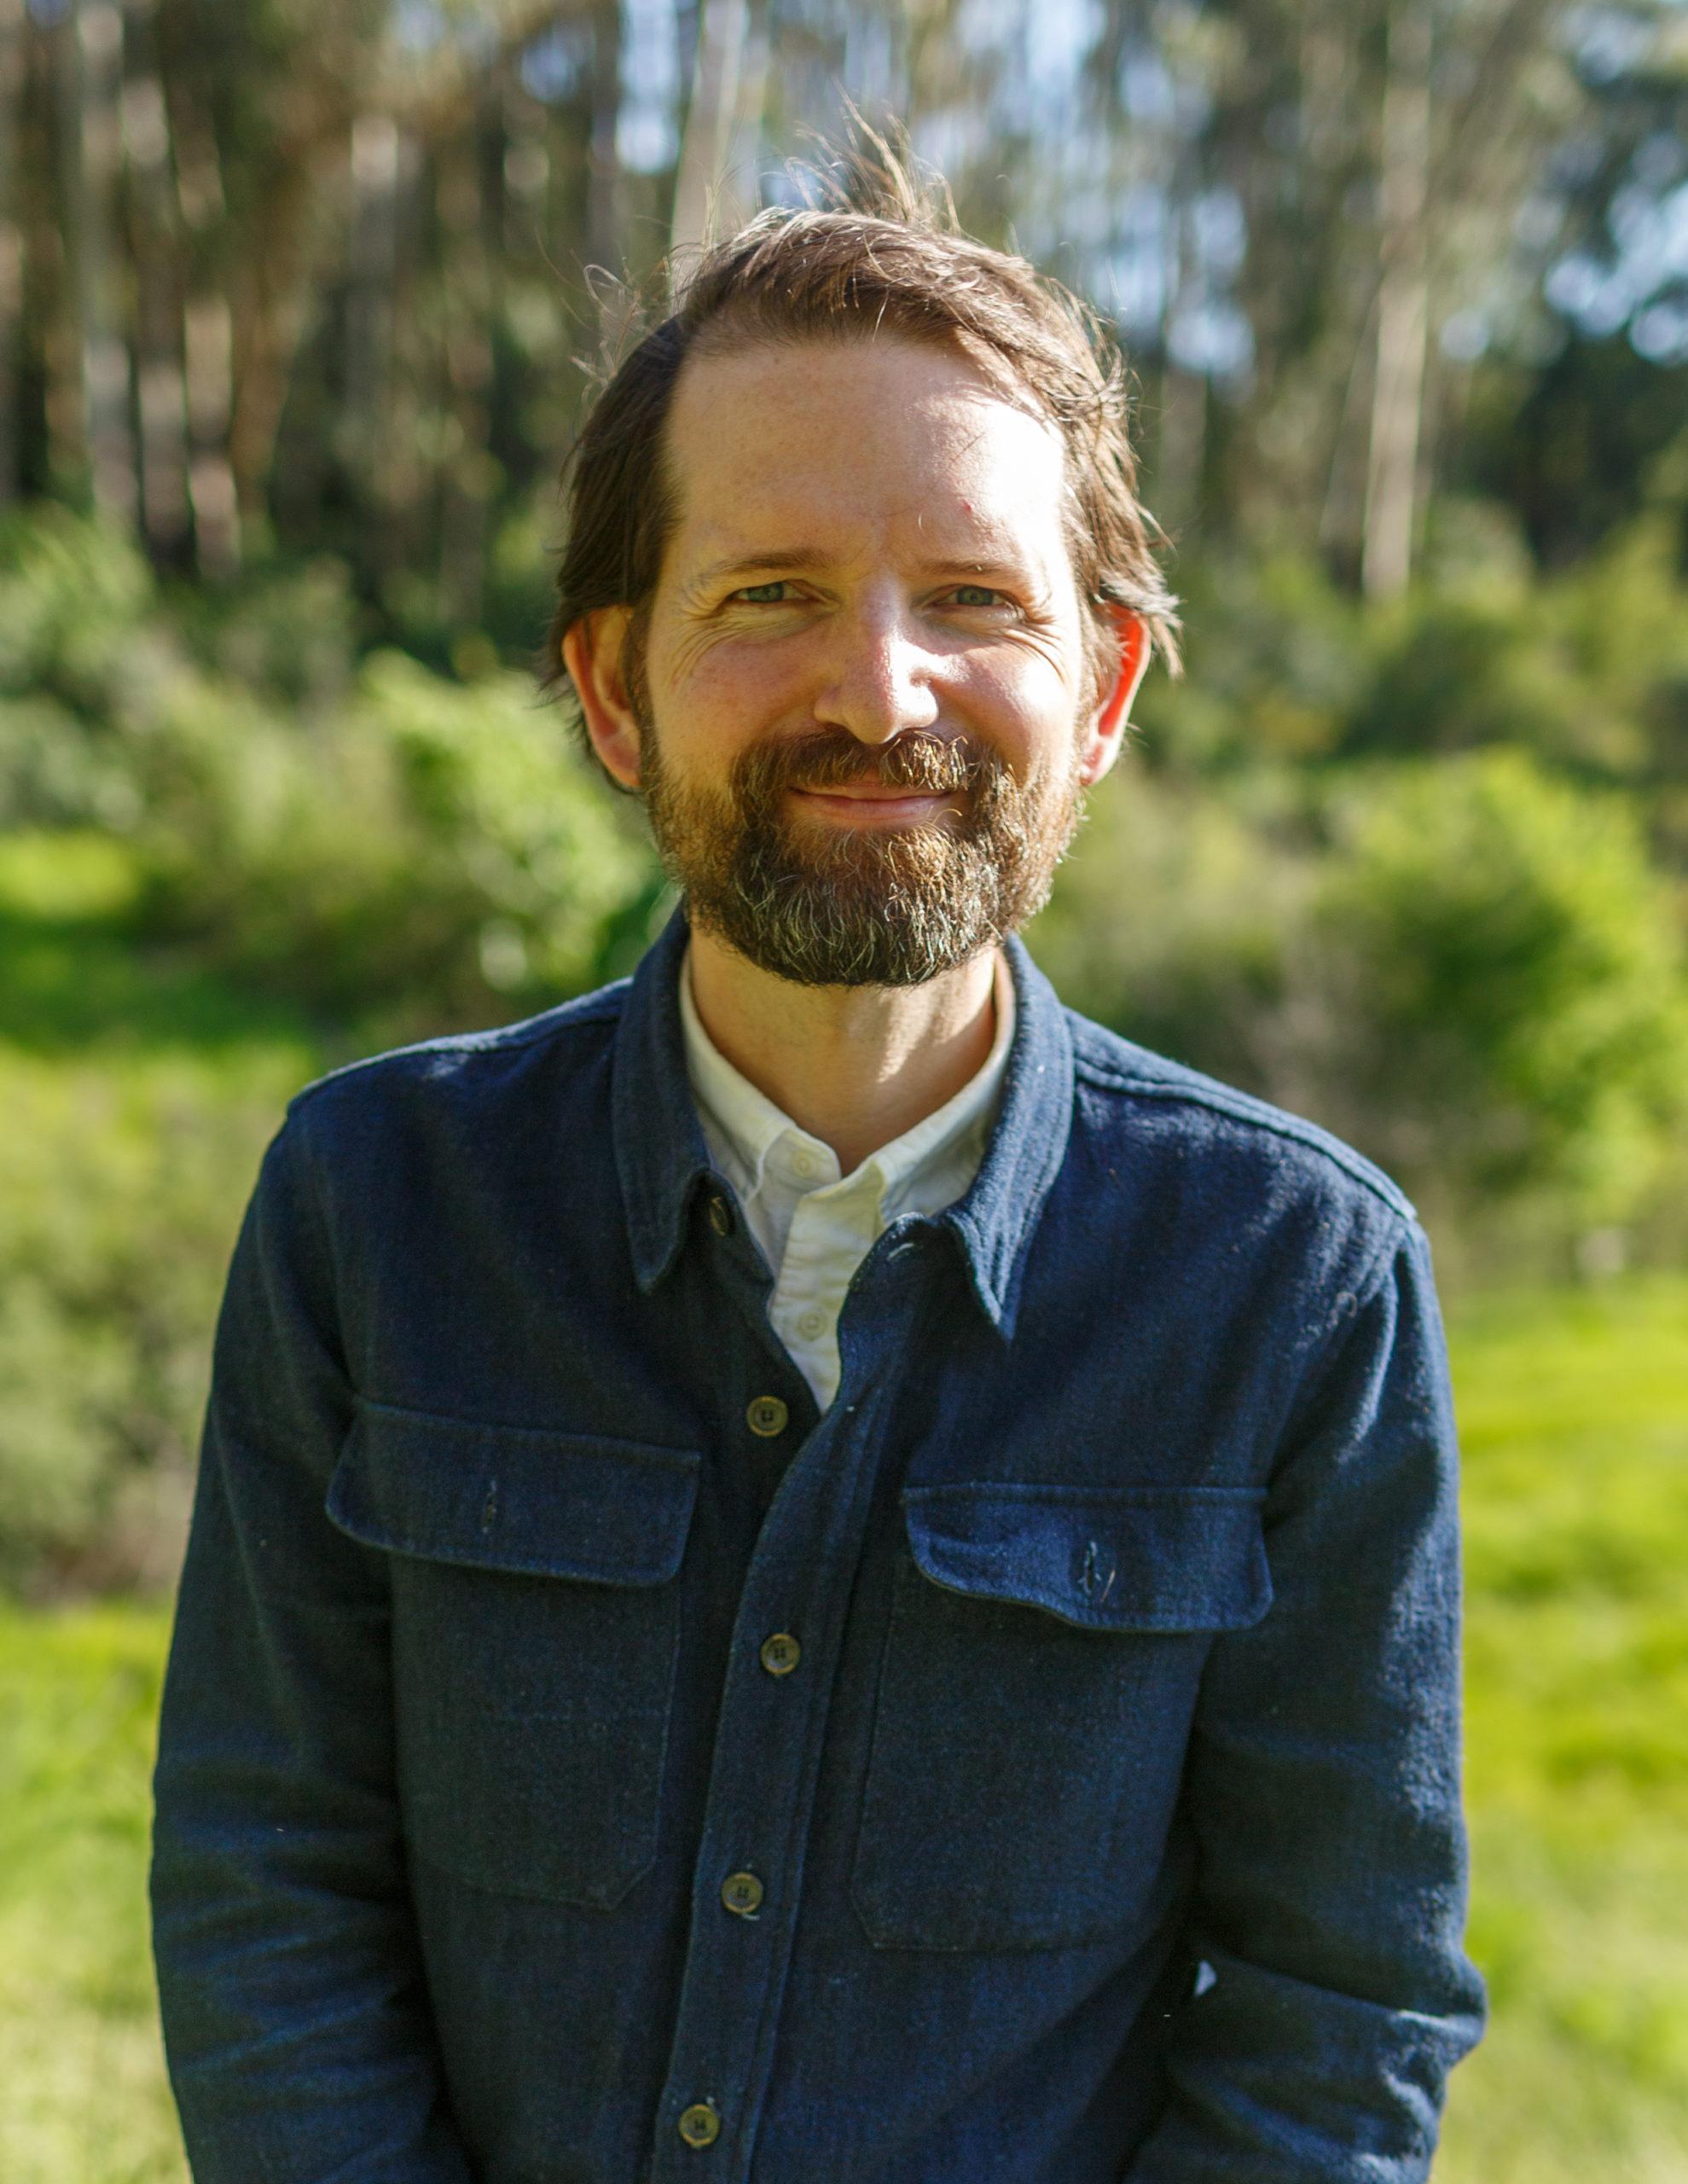 Philip Winn